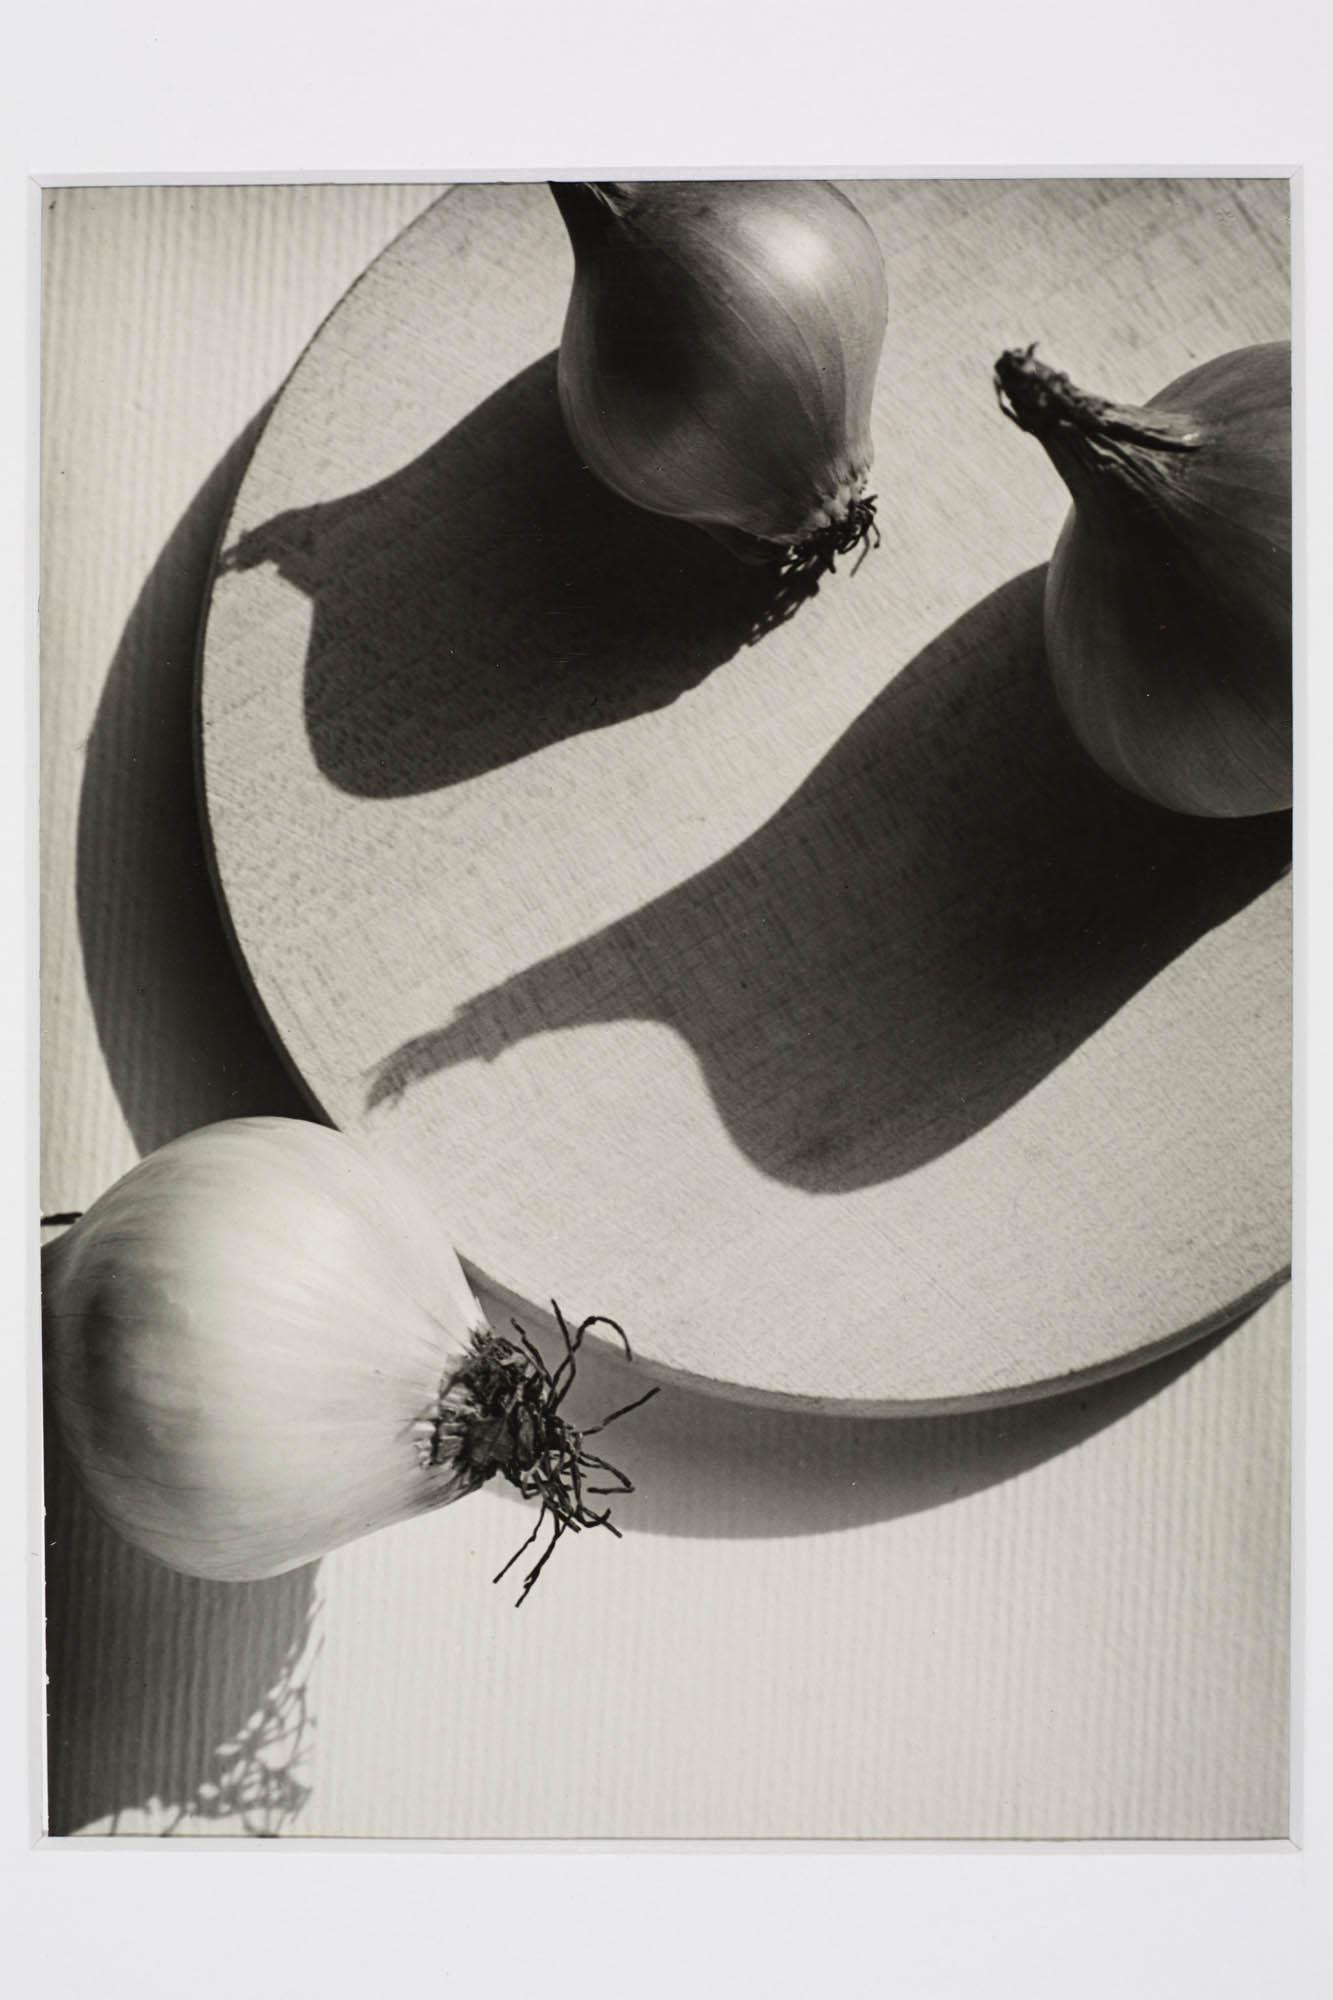 Schokoladen-Mischmaschine Hans Finsler Photographie objective